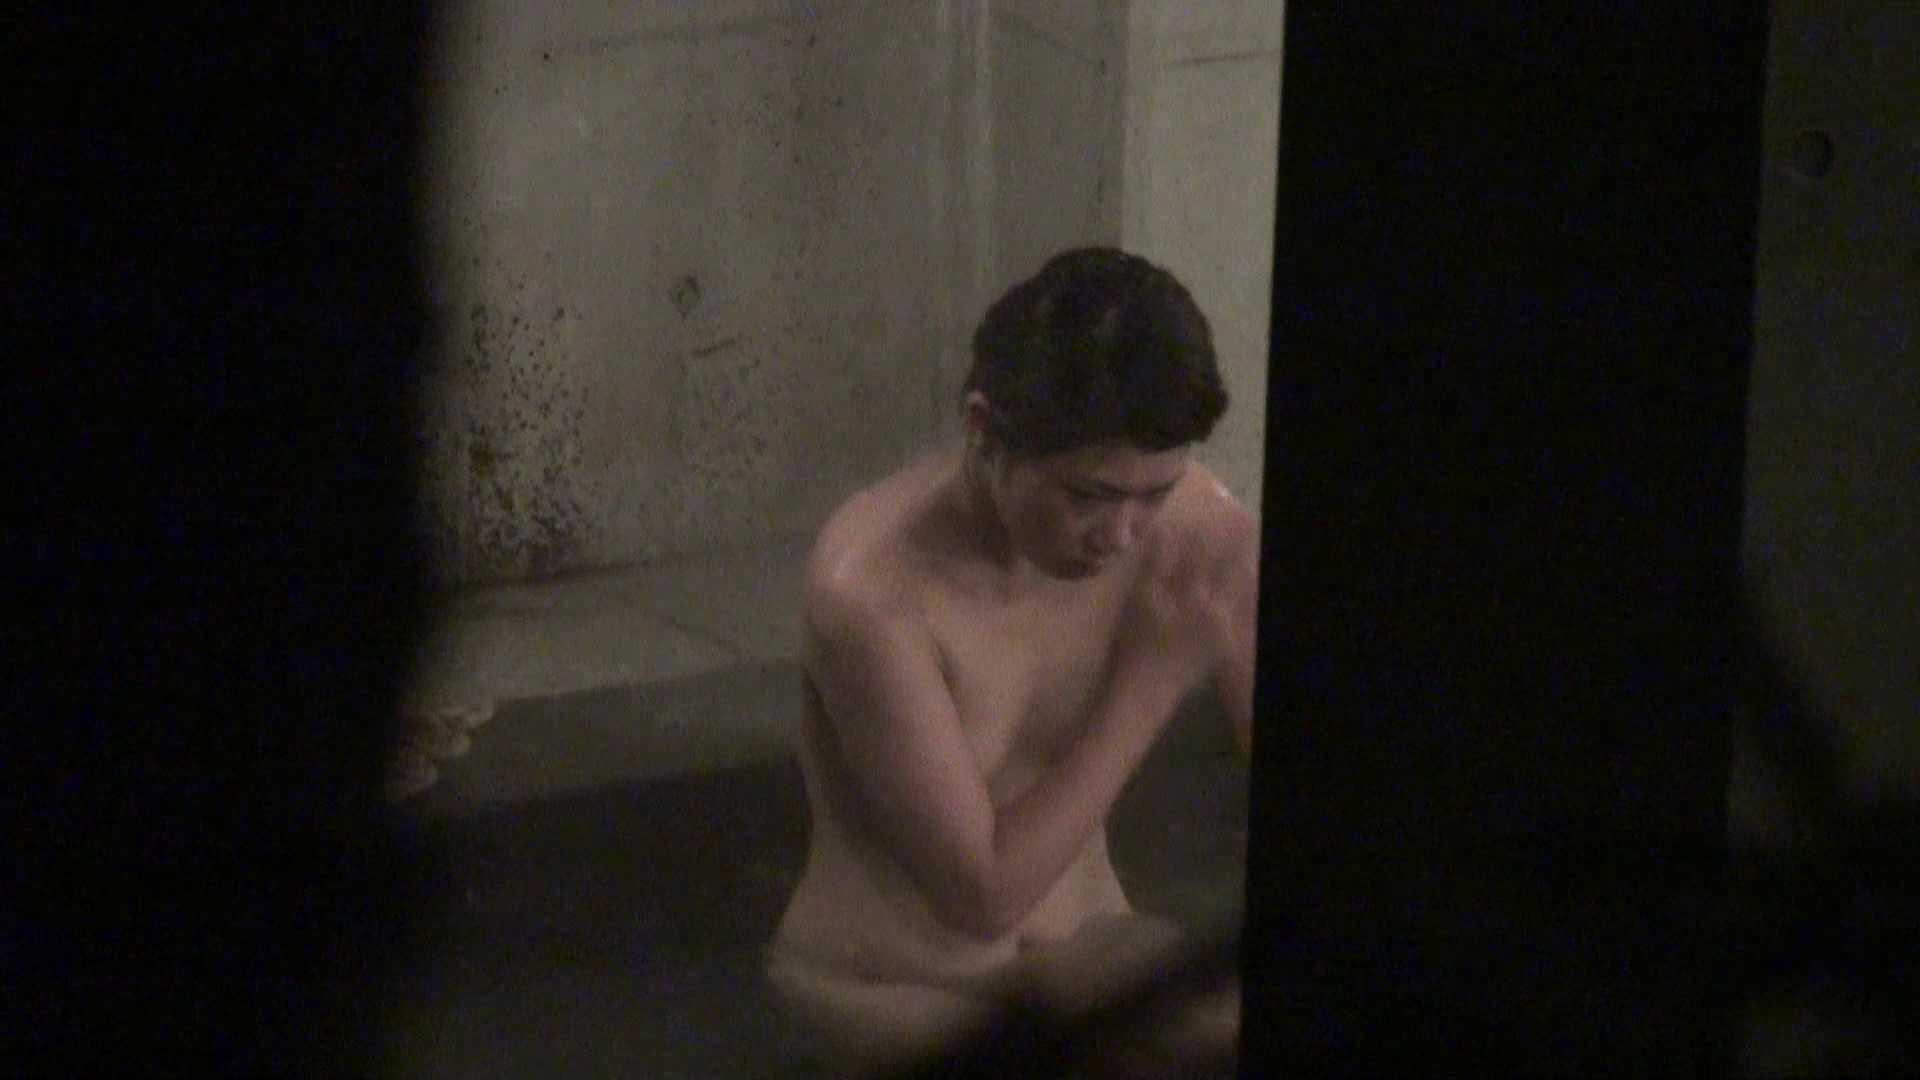 Aquaな露天風呂Vol.426 OLセックス 盗み撮りオマンコ動画キャプチャ 106画像 98